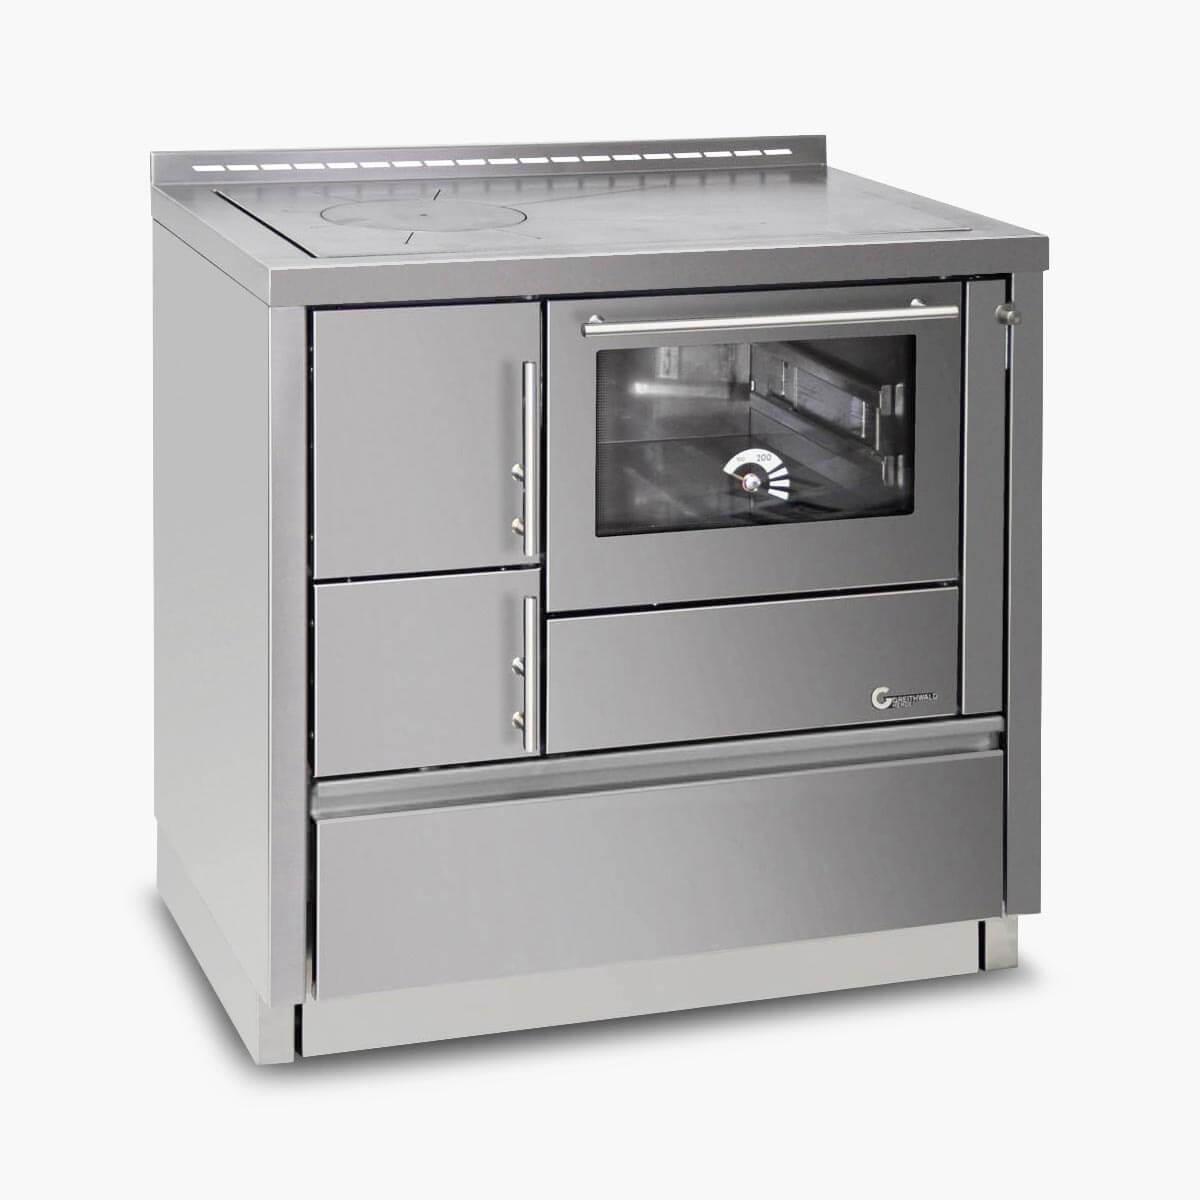 Cucina modello ÖKO Star ÖS 90